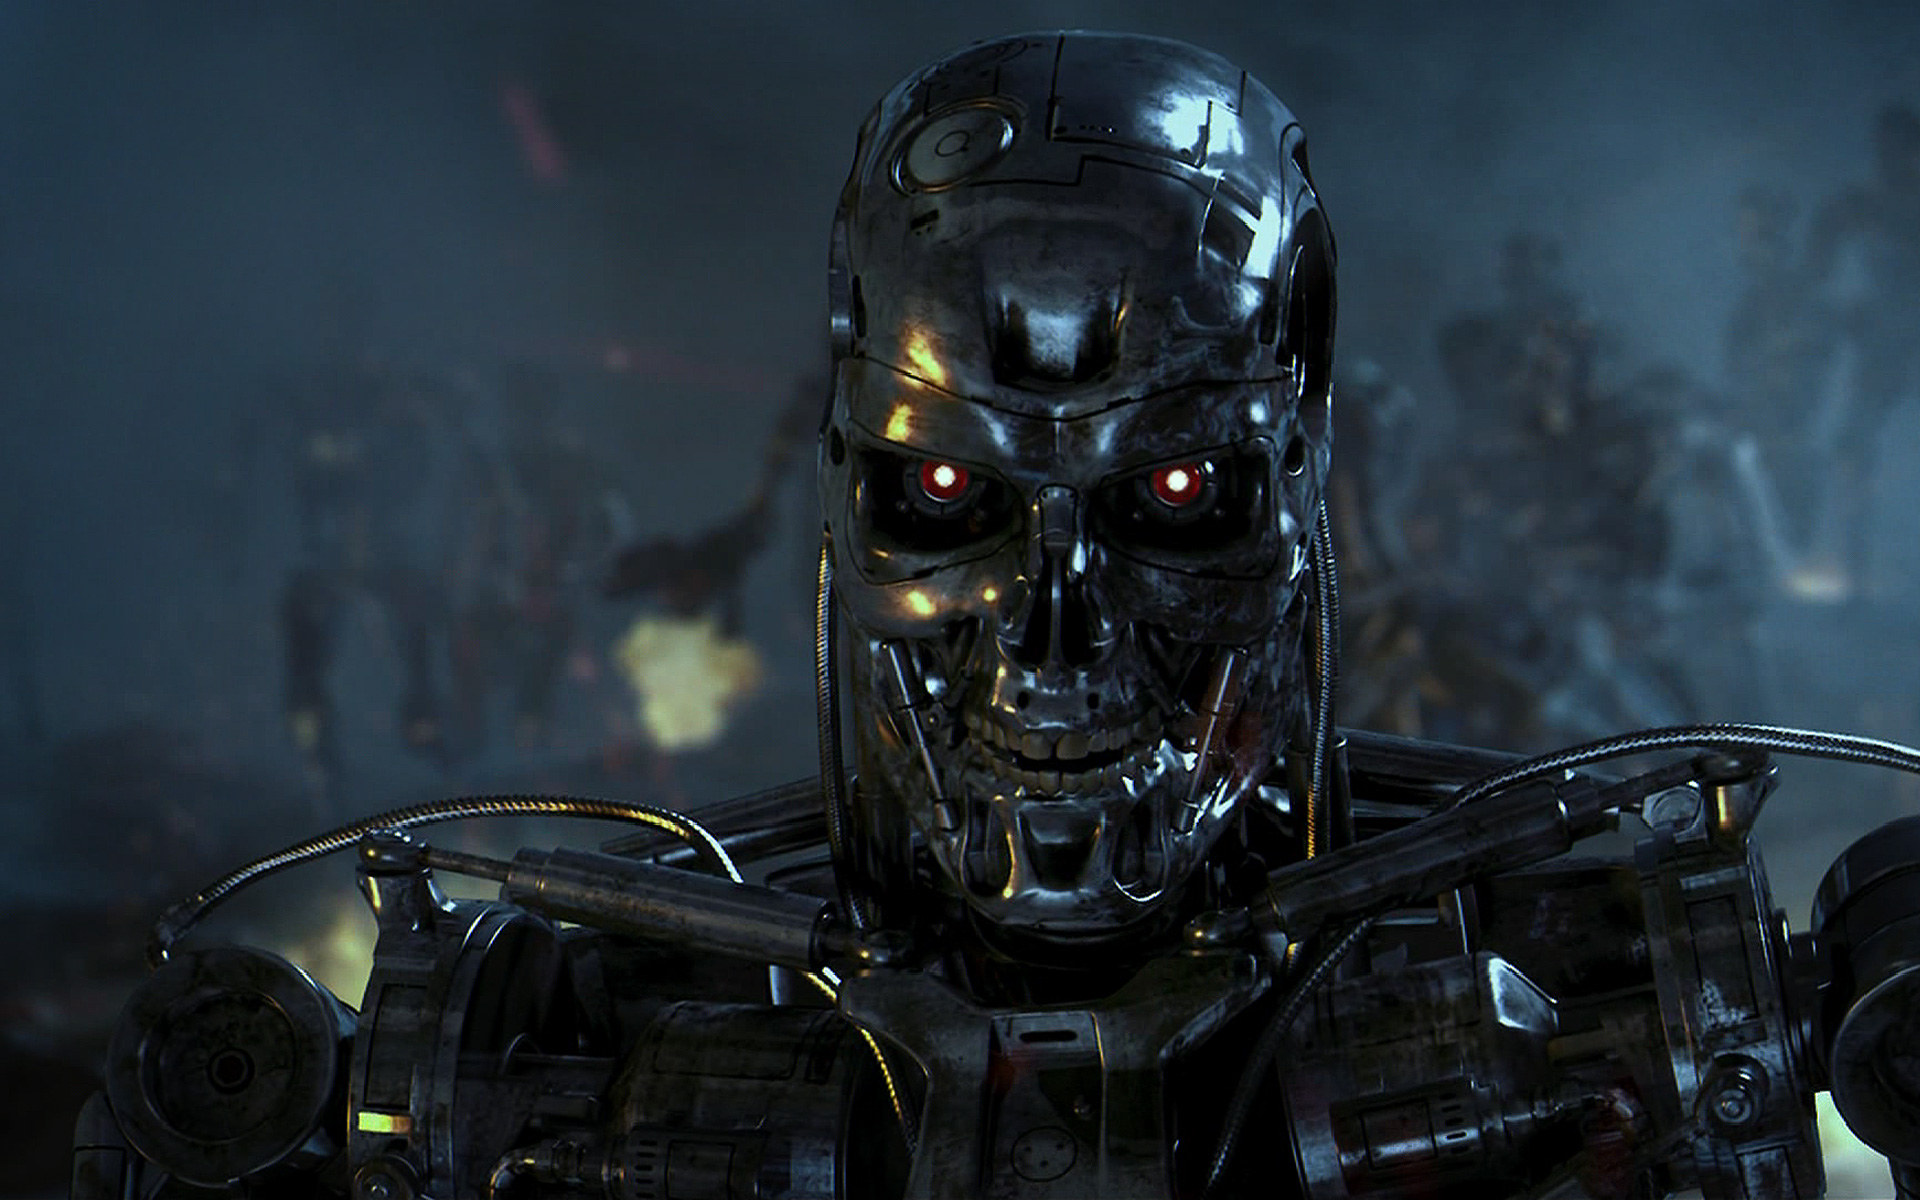 T 800 Terminator File history